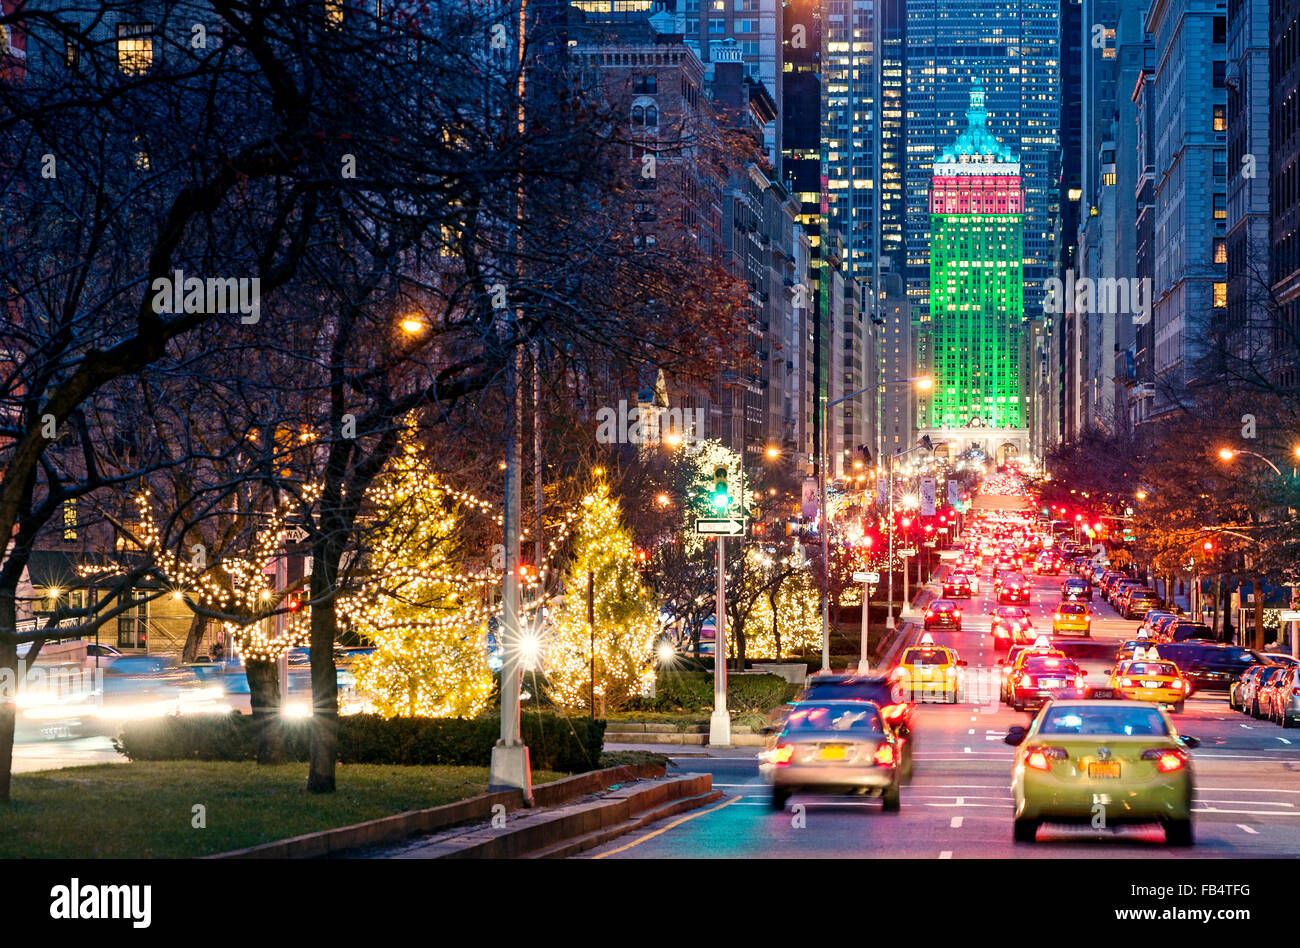 new york christmas new york streets park avenue new york city christmas decorations christmas trees traffic